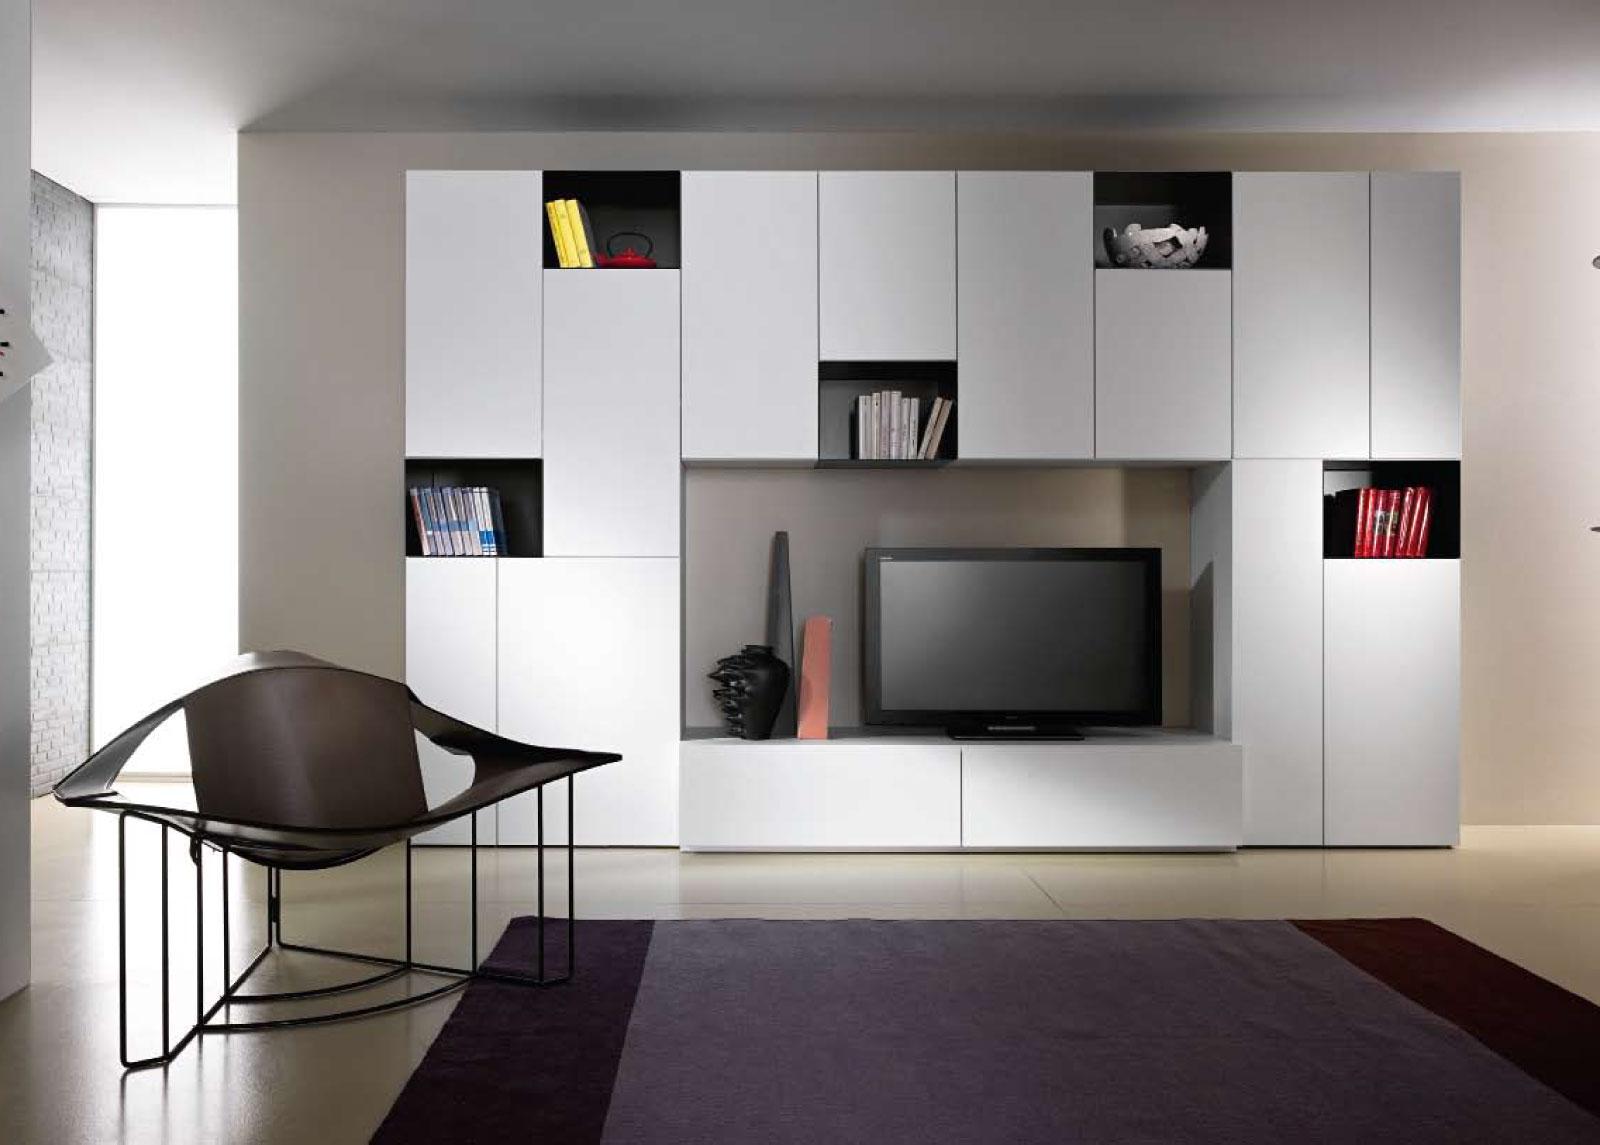 Soggiorni Moderni In Offerta. Free Stunning Semeraro ...